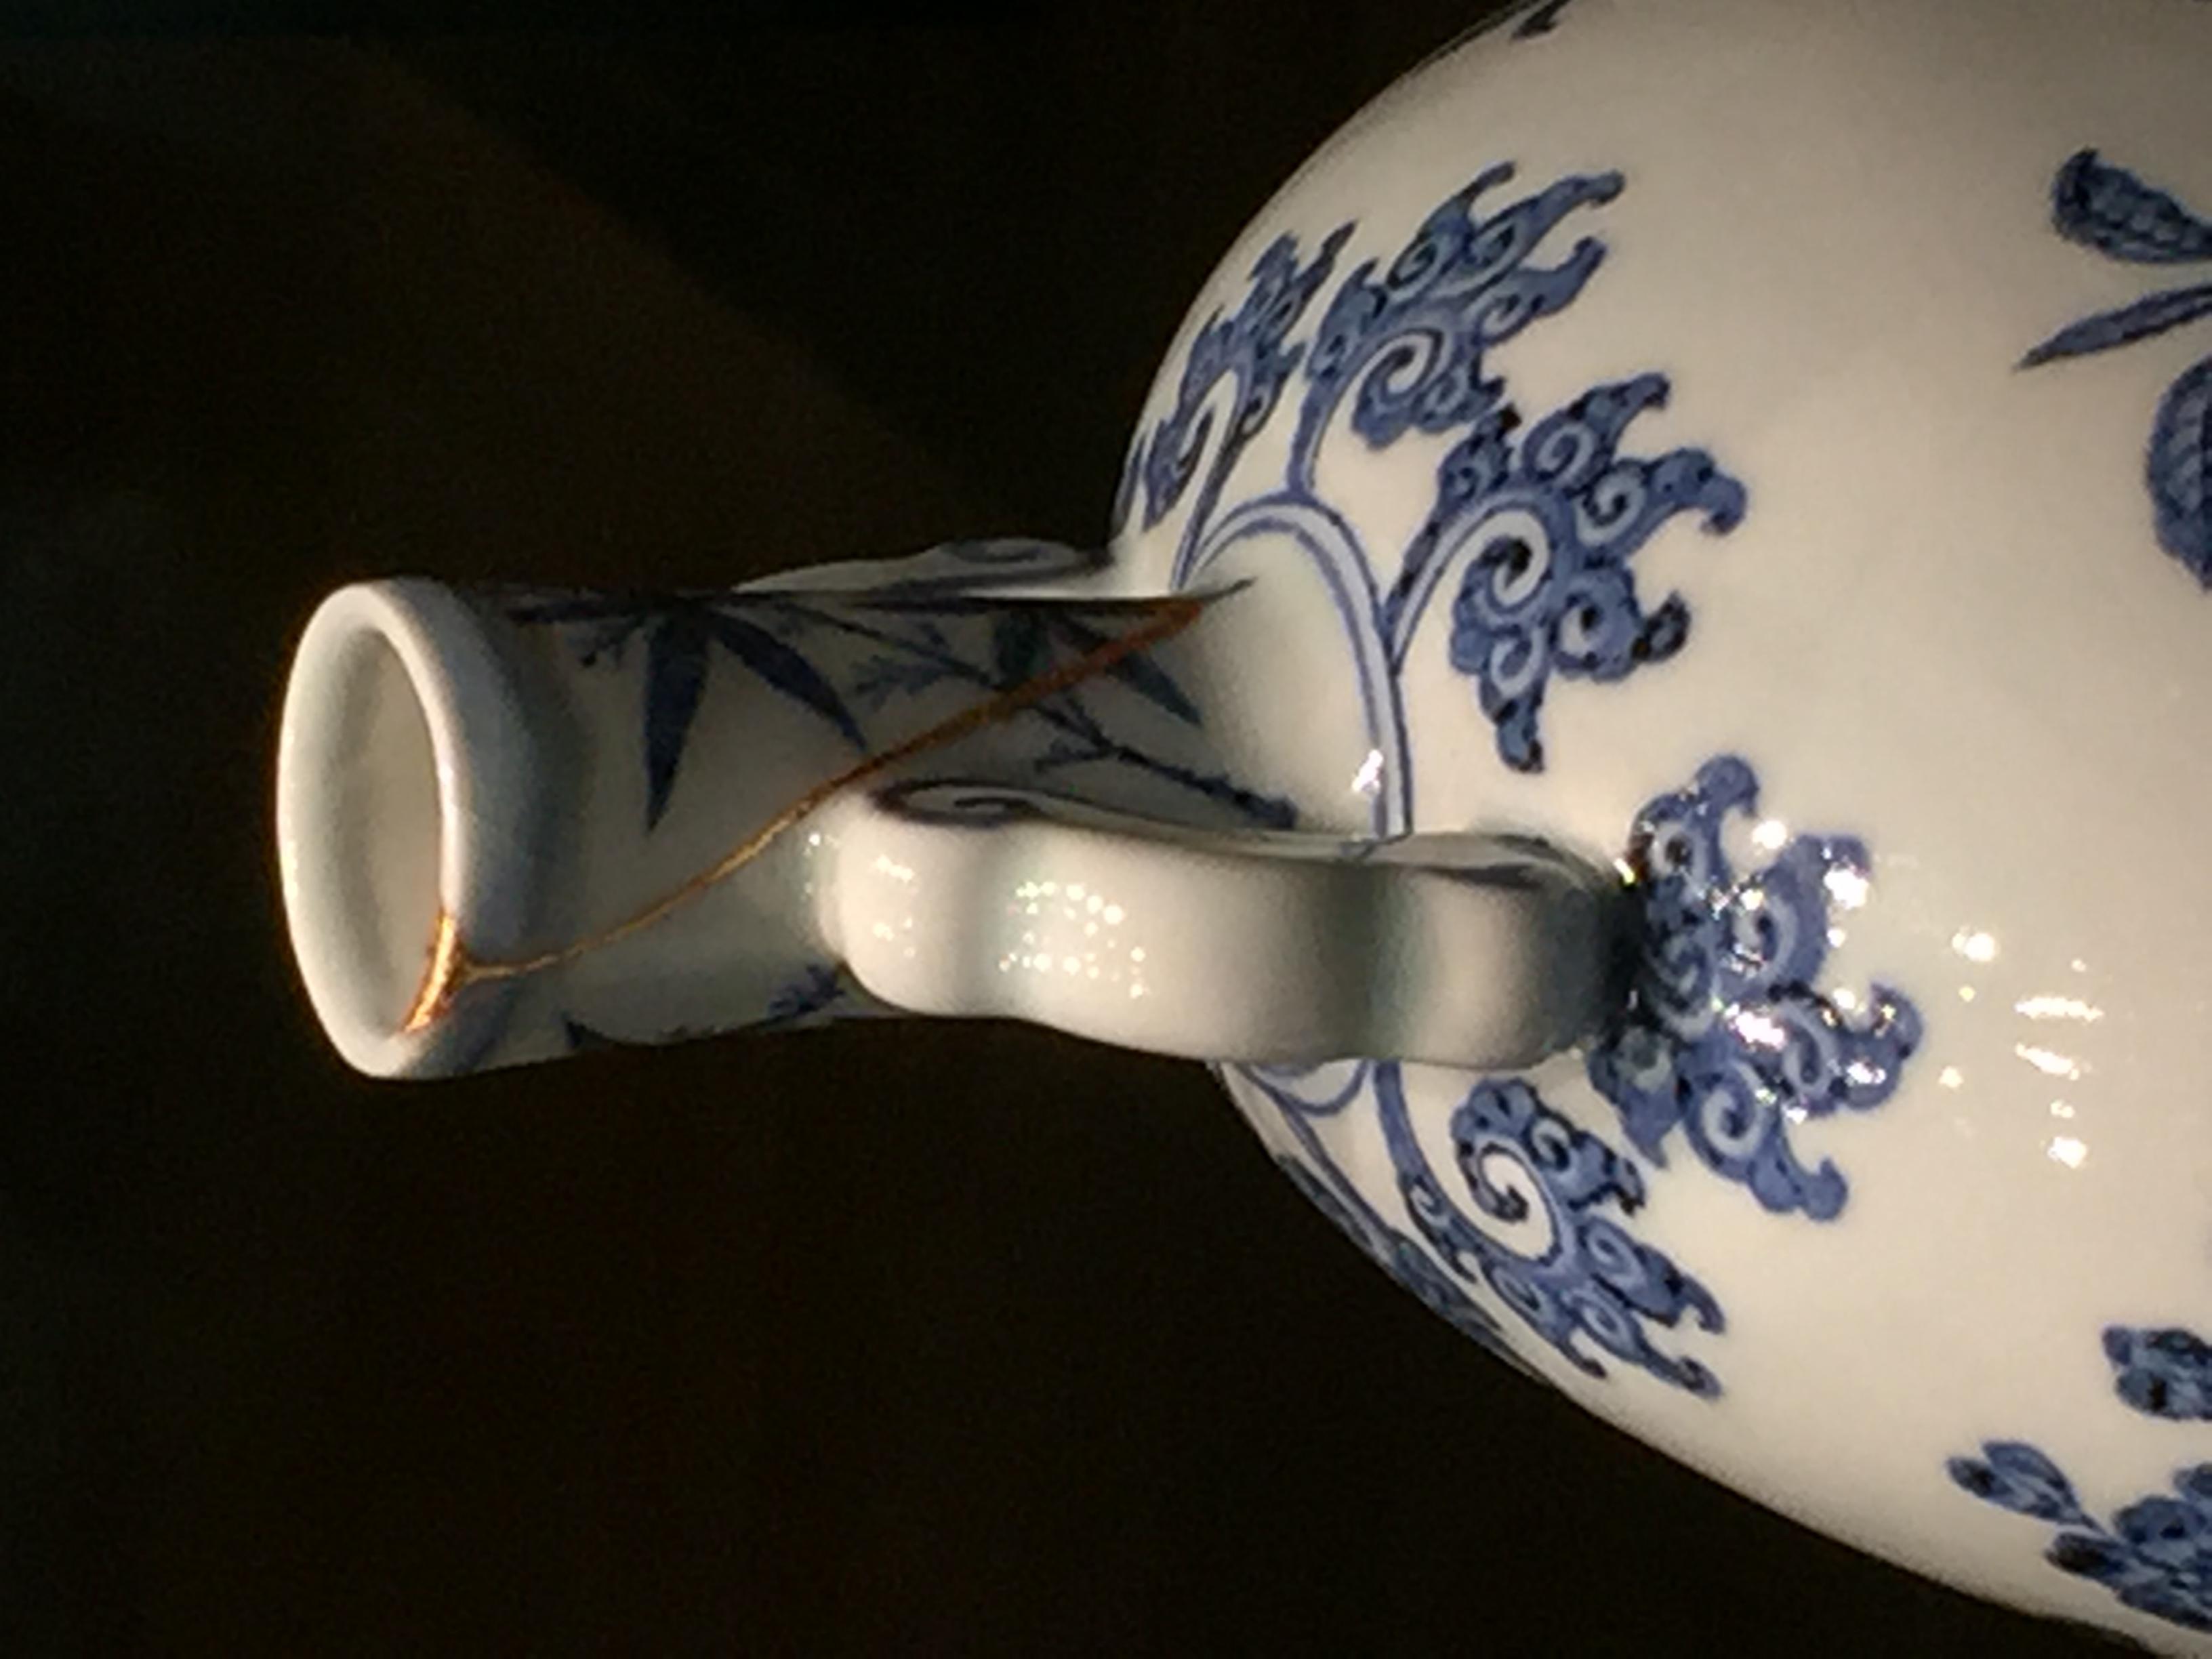 Chinese-Porcelain-British-Museum-Percival-David-jessewaugh.com-52.jpg